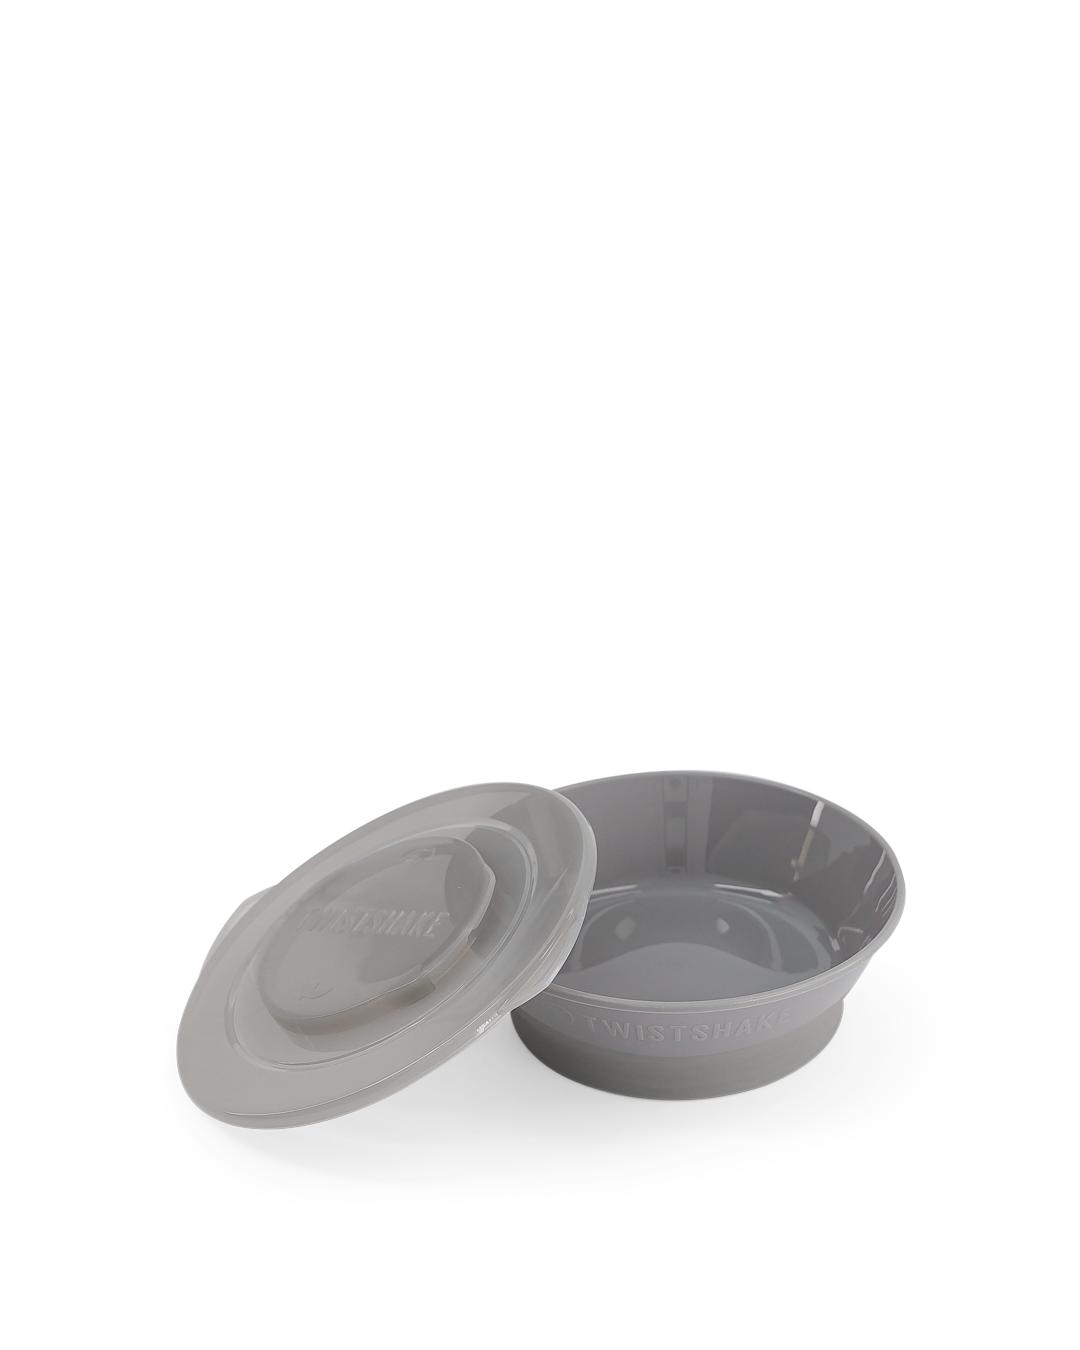 TWISTSHAKE 78154 Miska Bowl 6+ m Pastelovo siv�